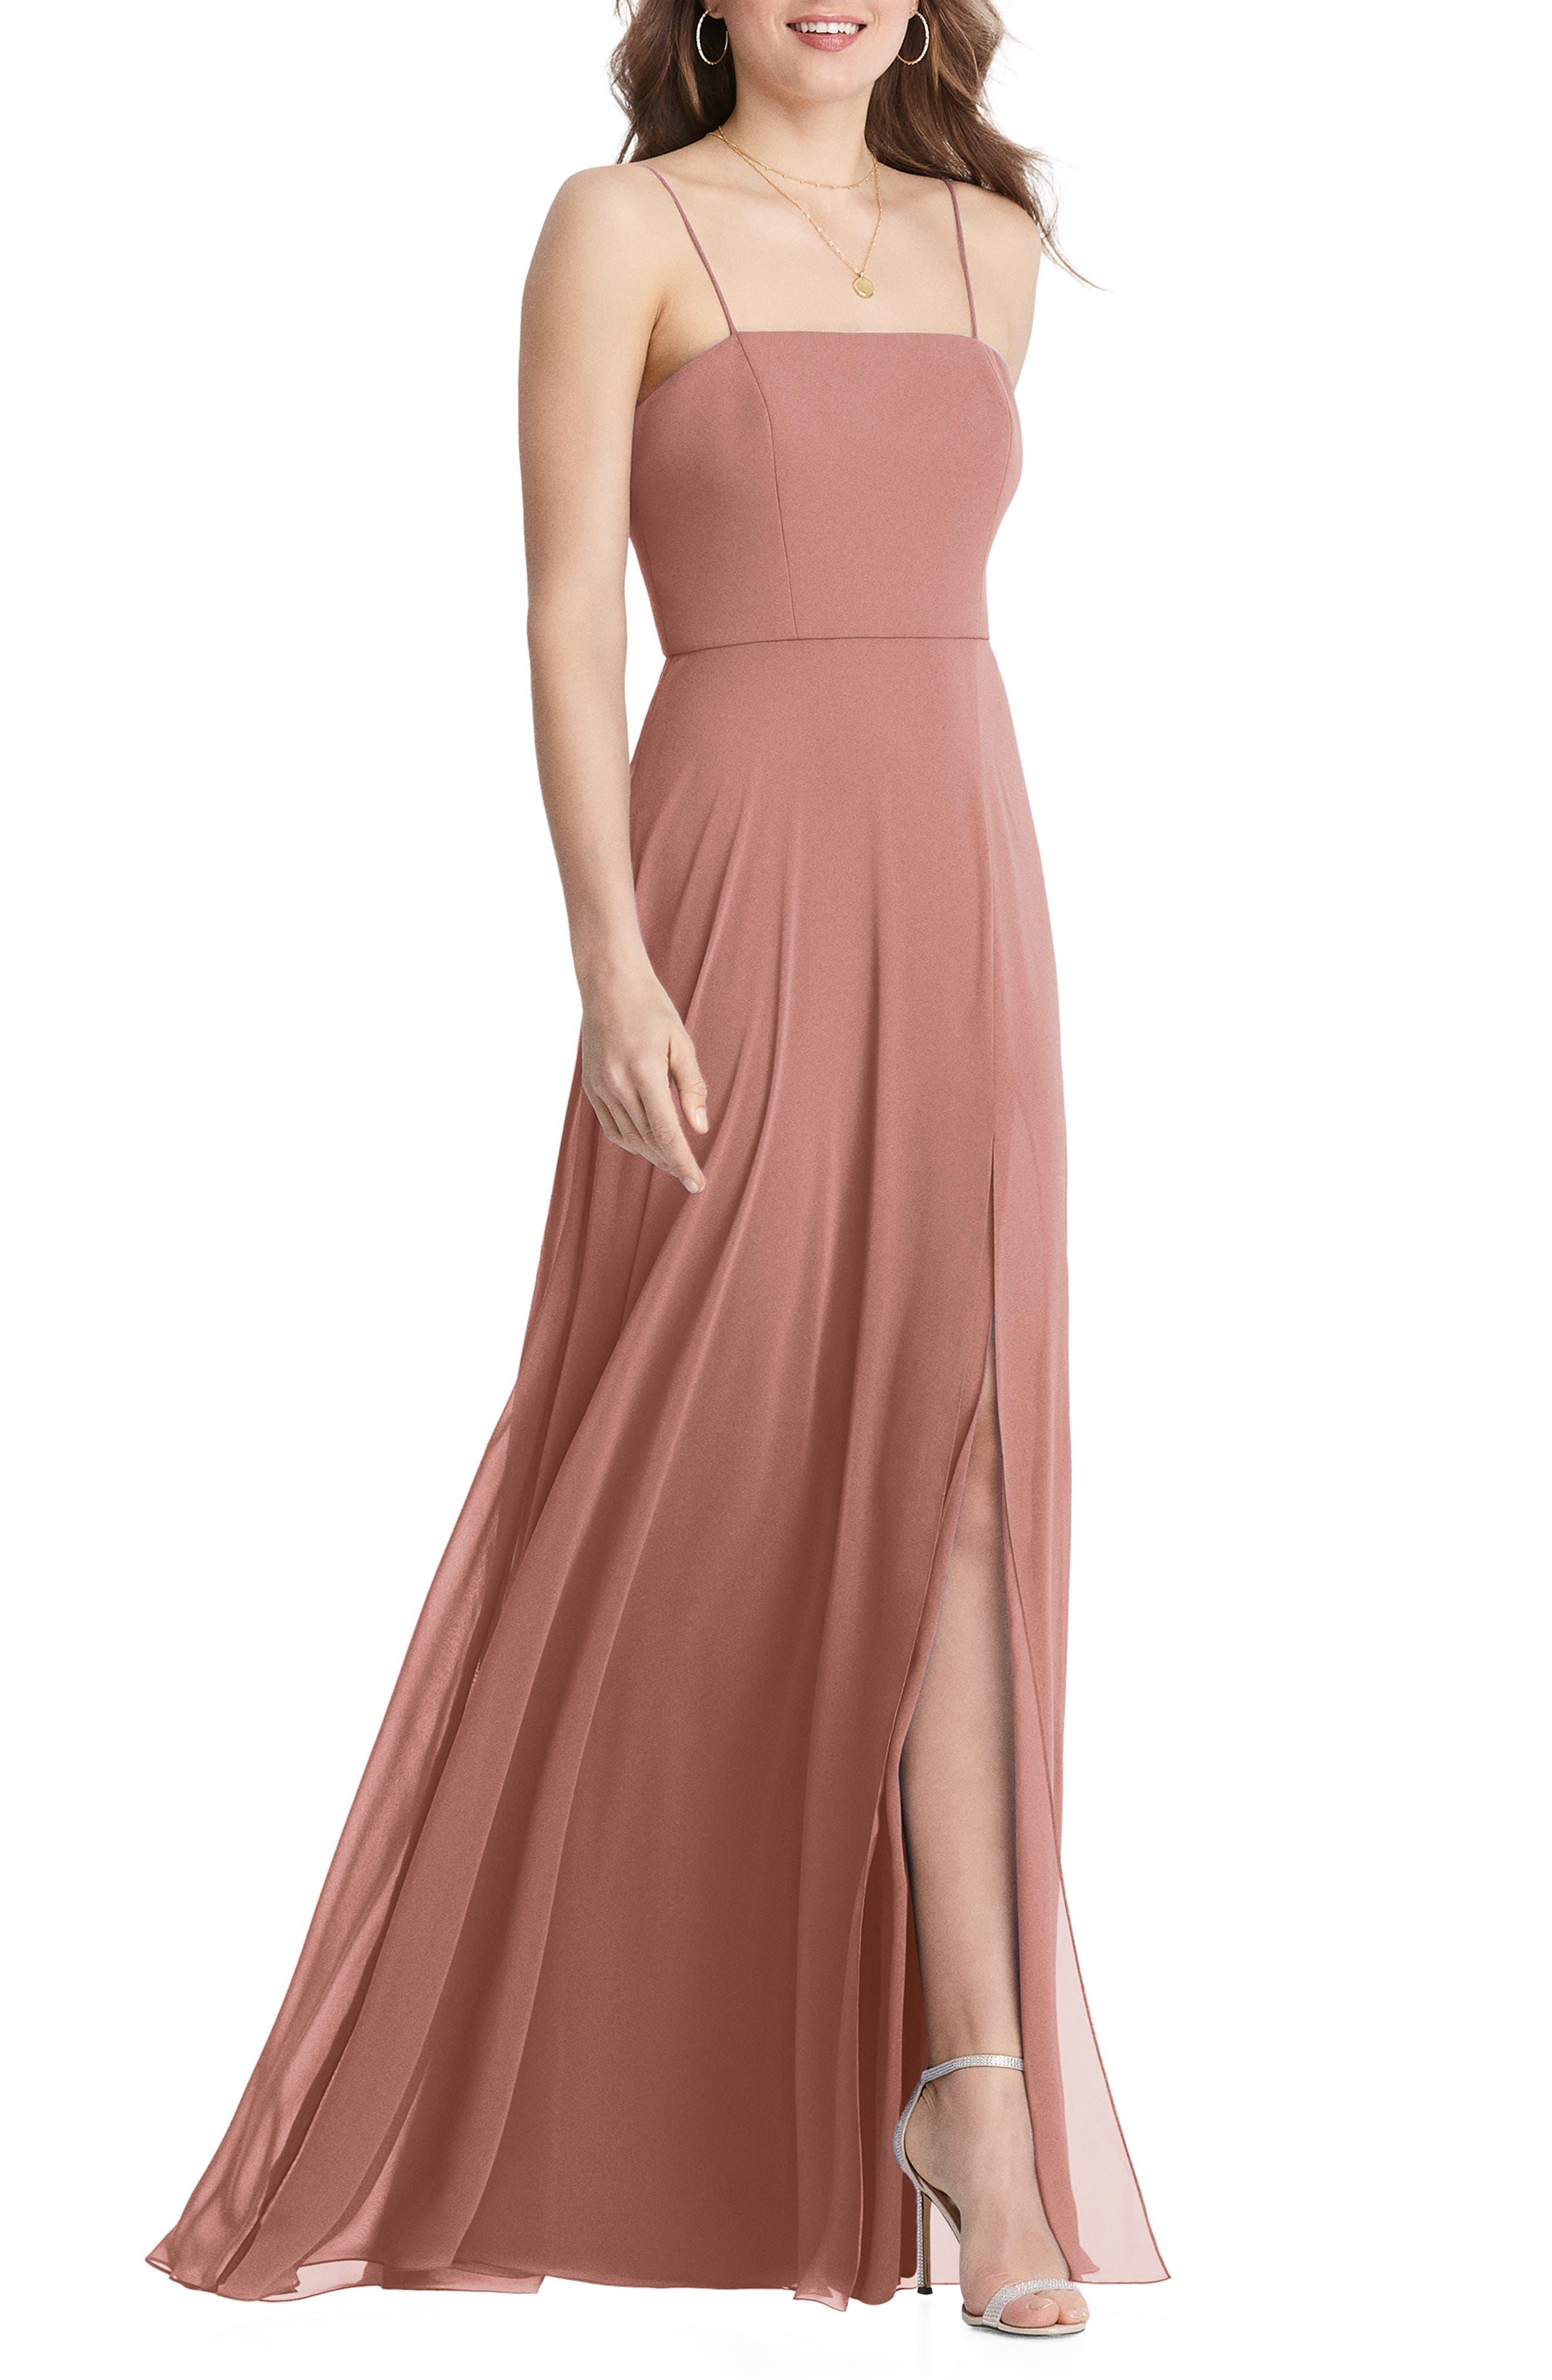 Elliott Square Neck Chiffon Gown